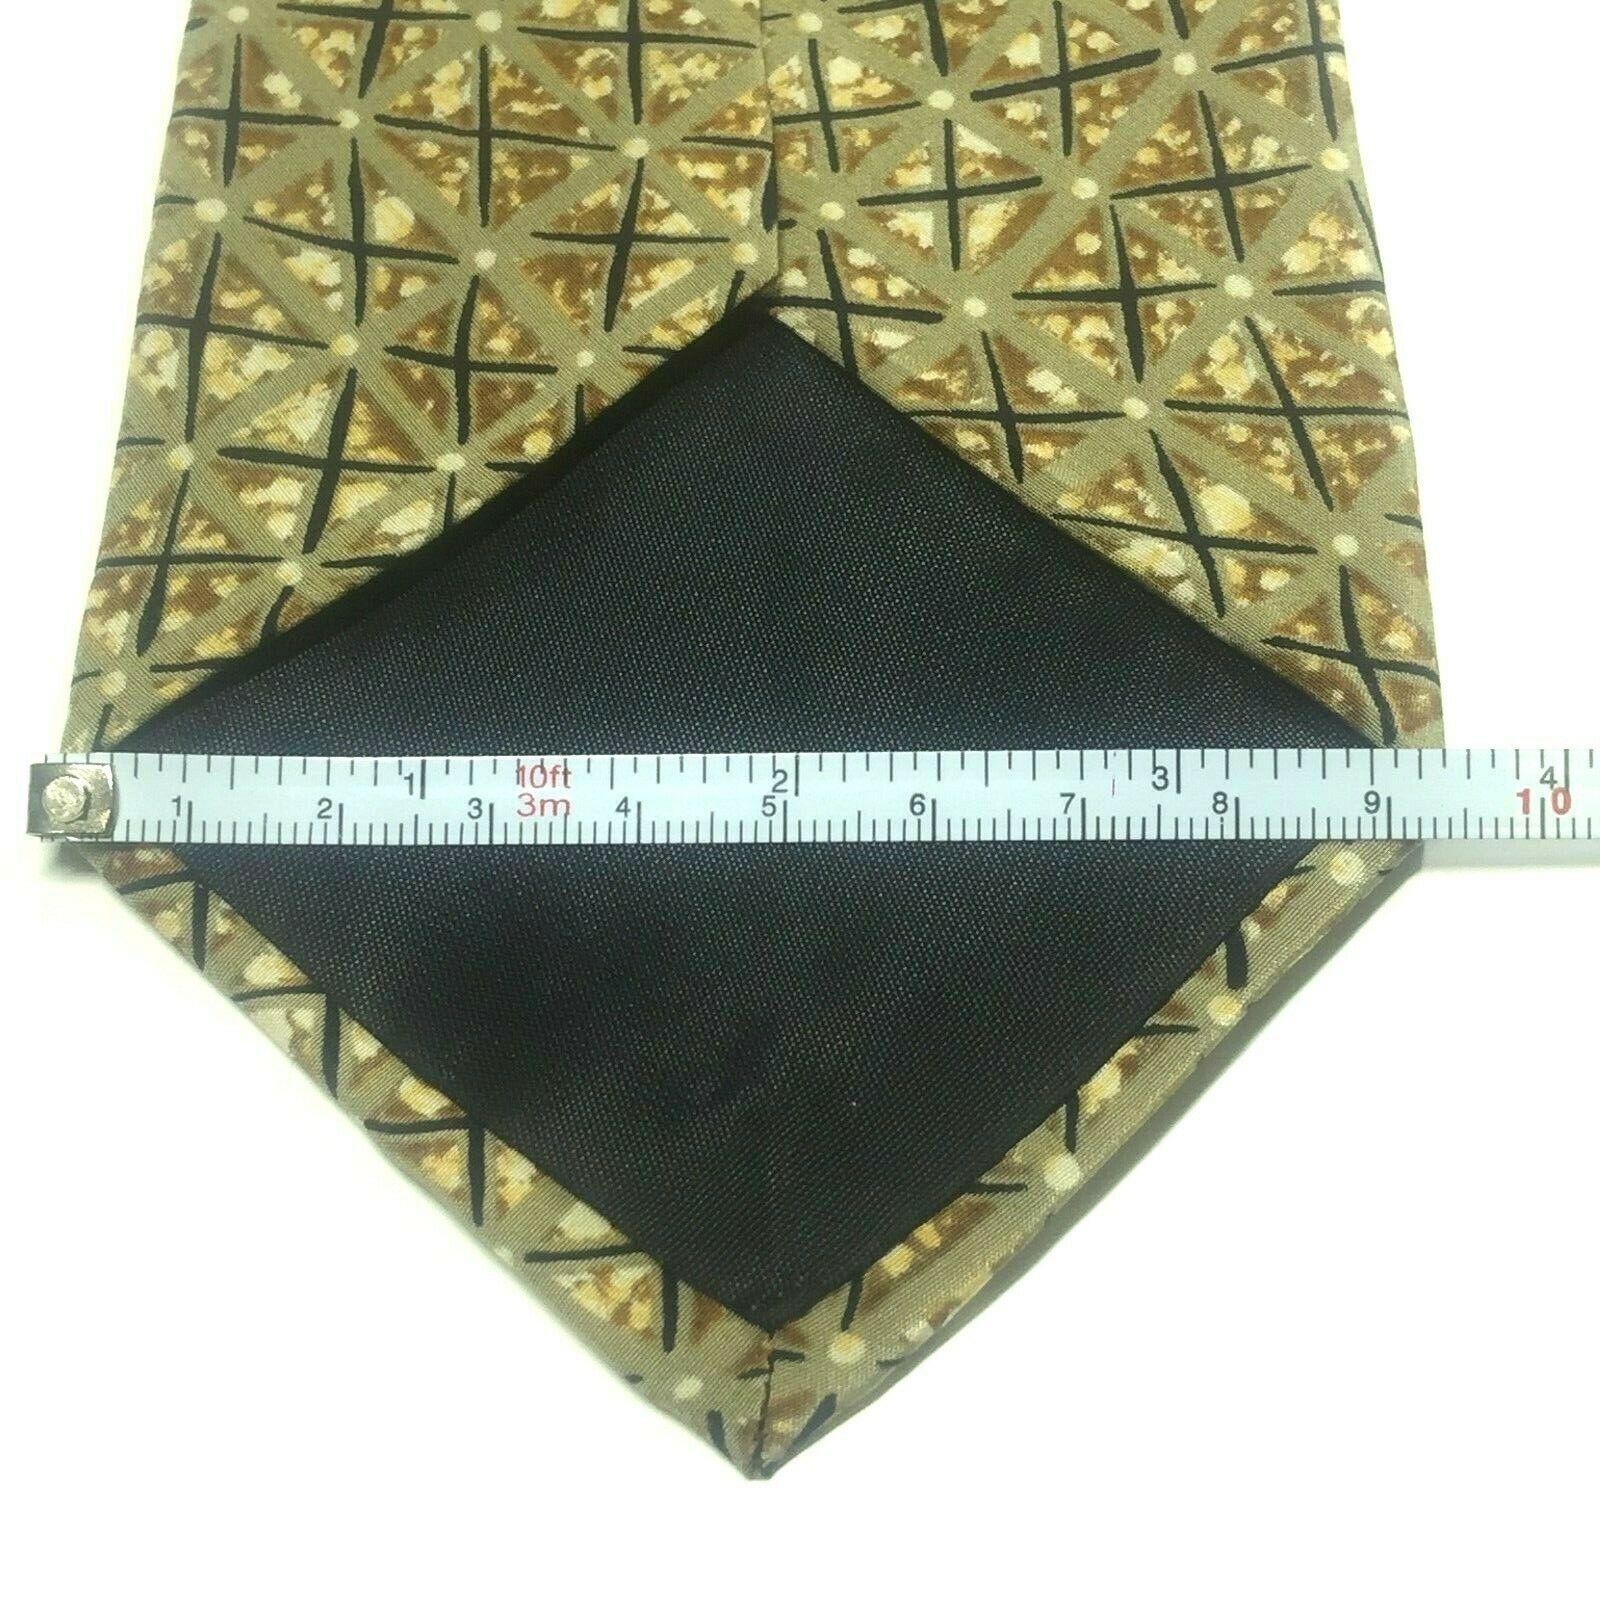 "Structure Men's Tie, 3.75"" X 58"" Necktie, 100% Silk, Brown Geometric Print image 6"